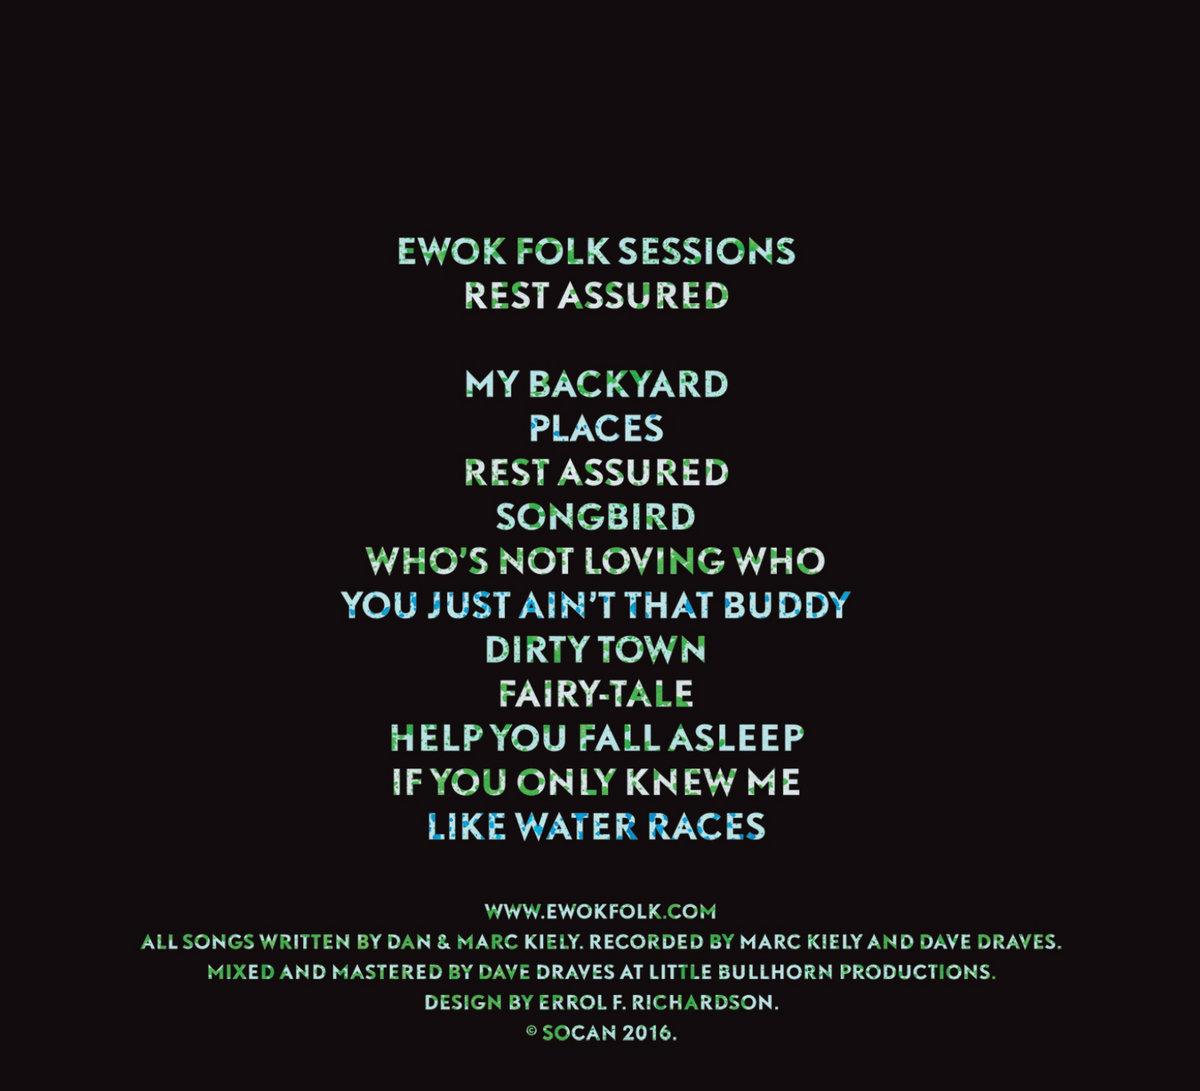 rest assured ewok folk sessions